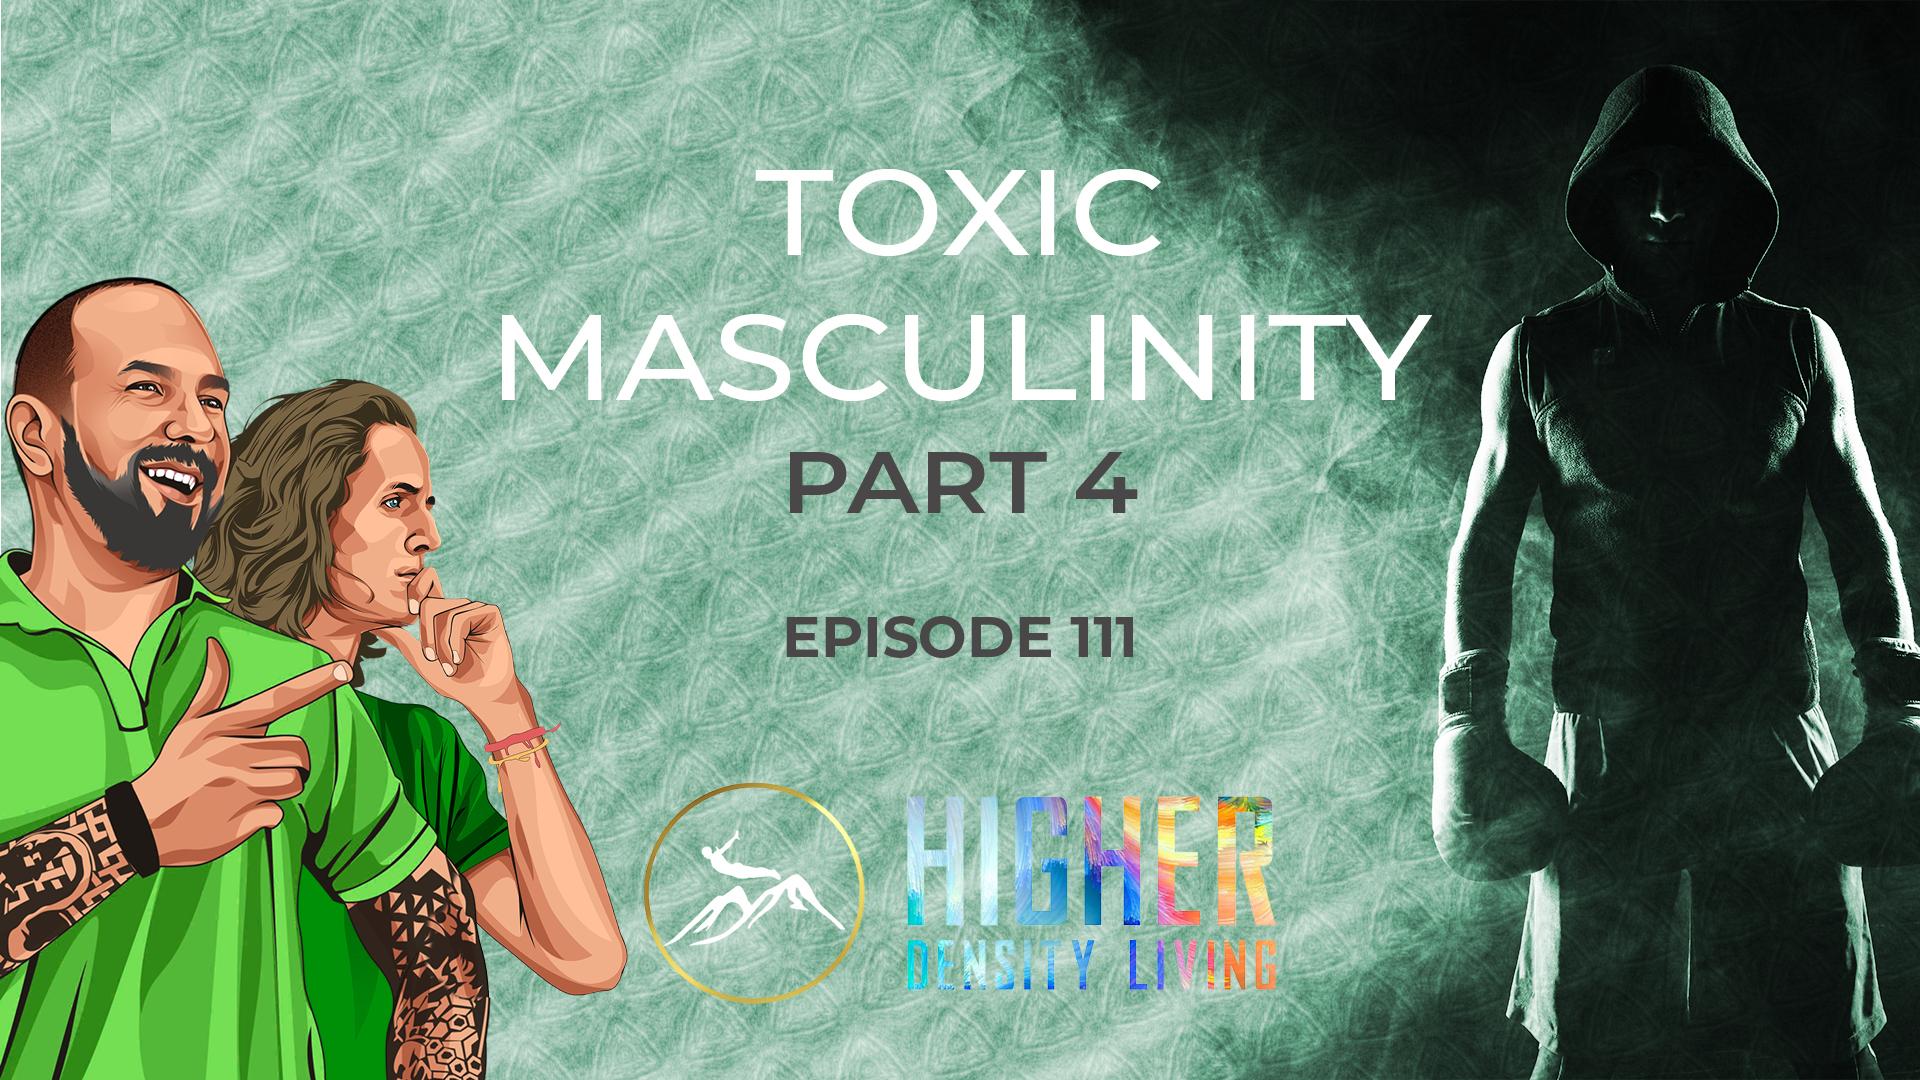 Toxic Masculinity - Part 4